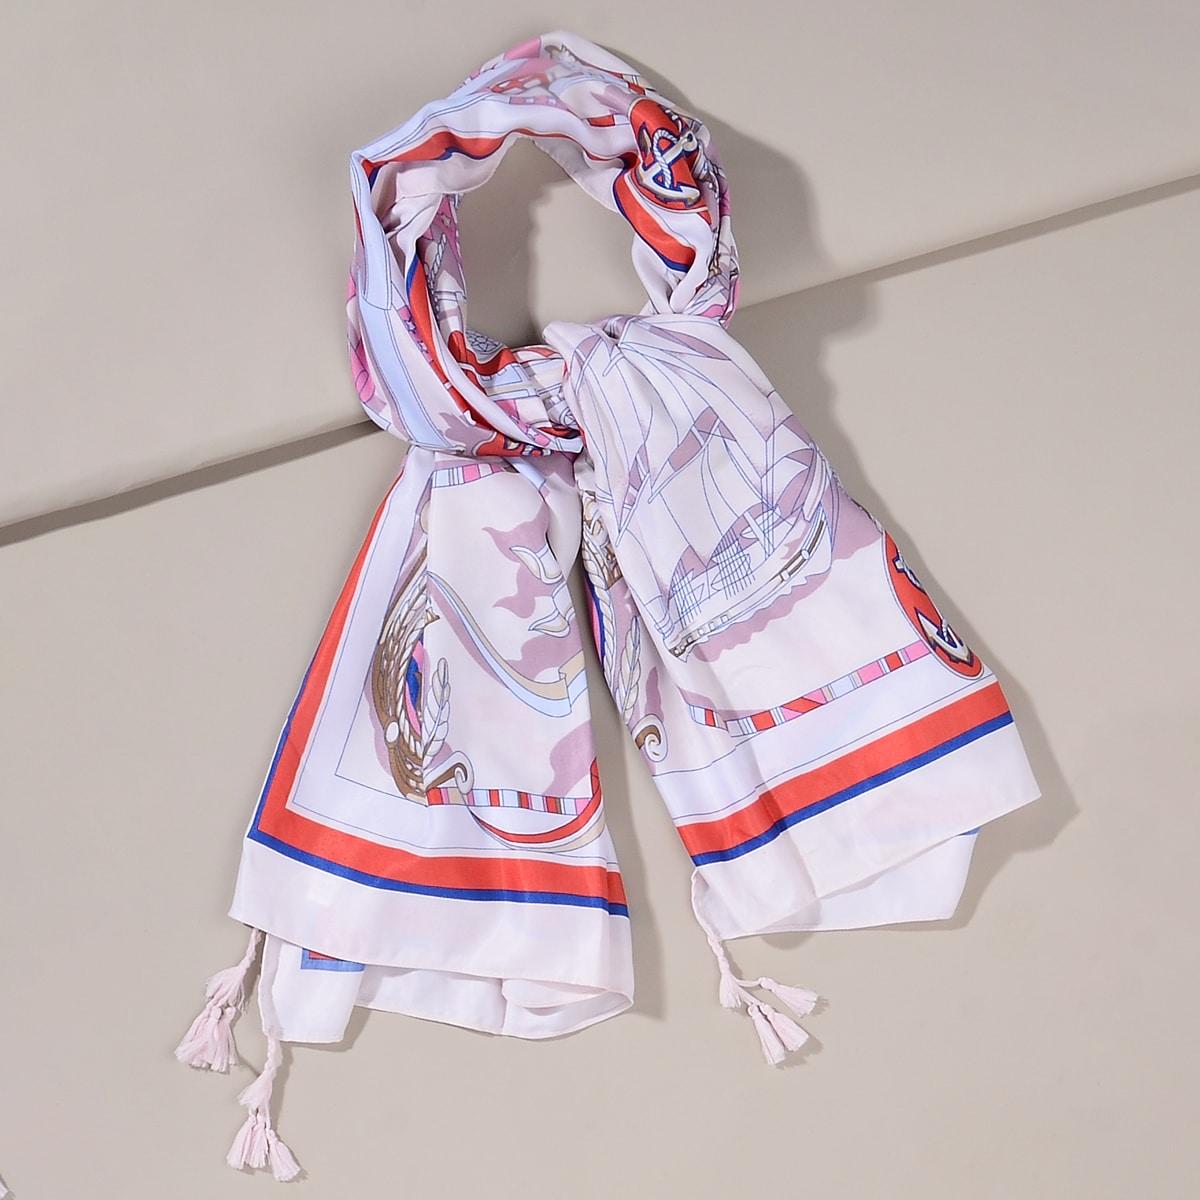 shein Ankerpatroon sjaal